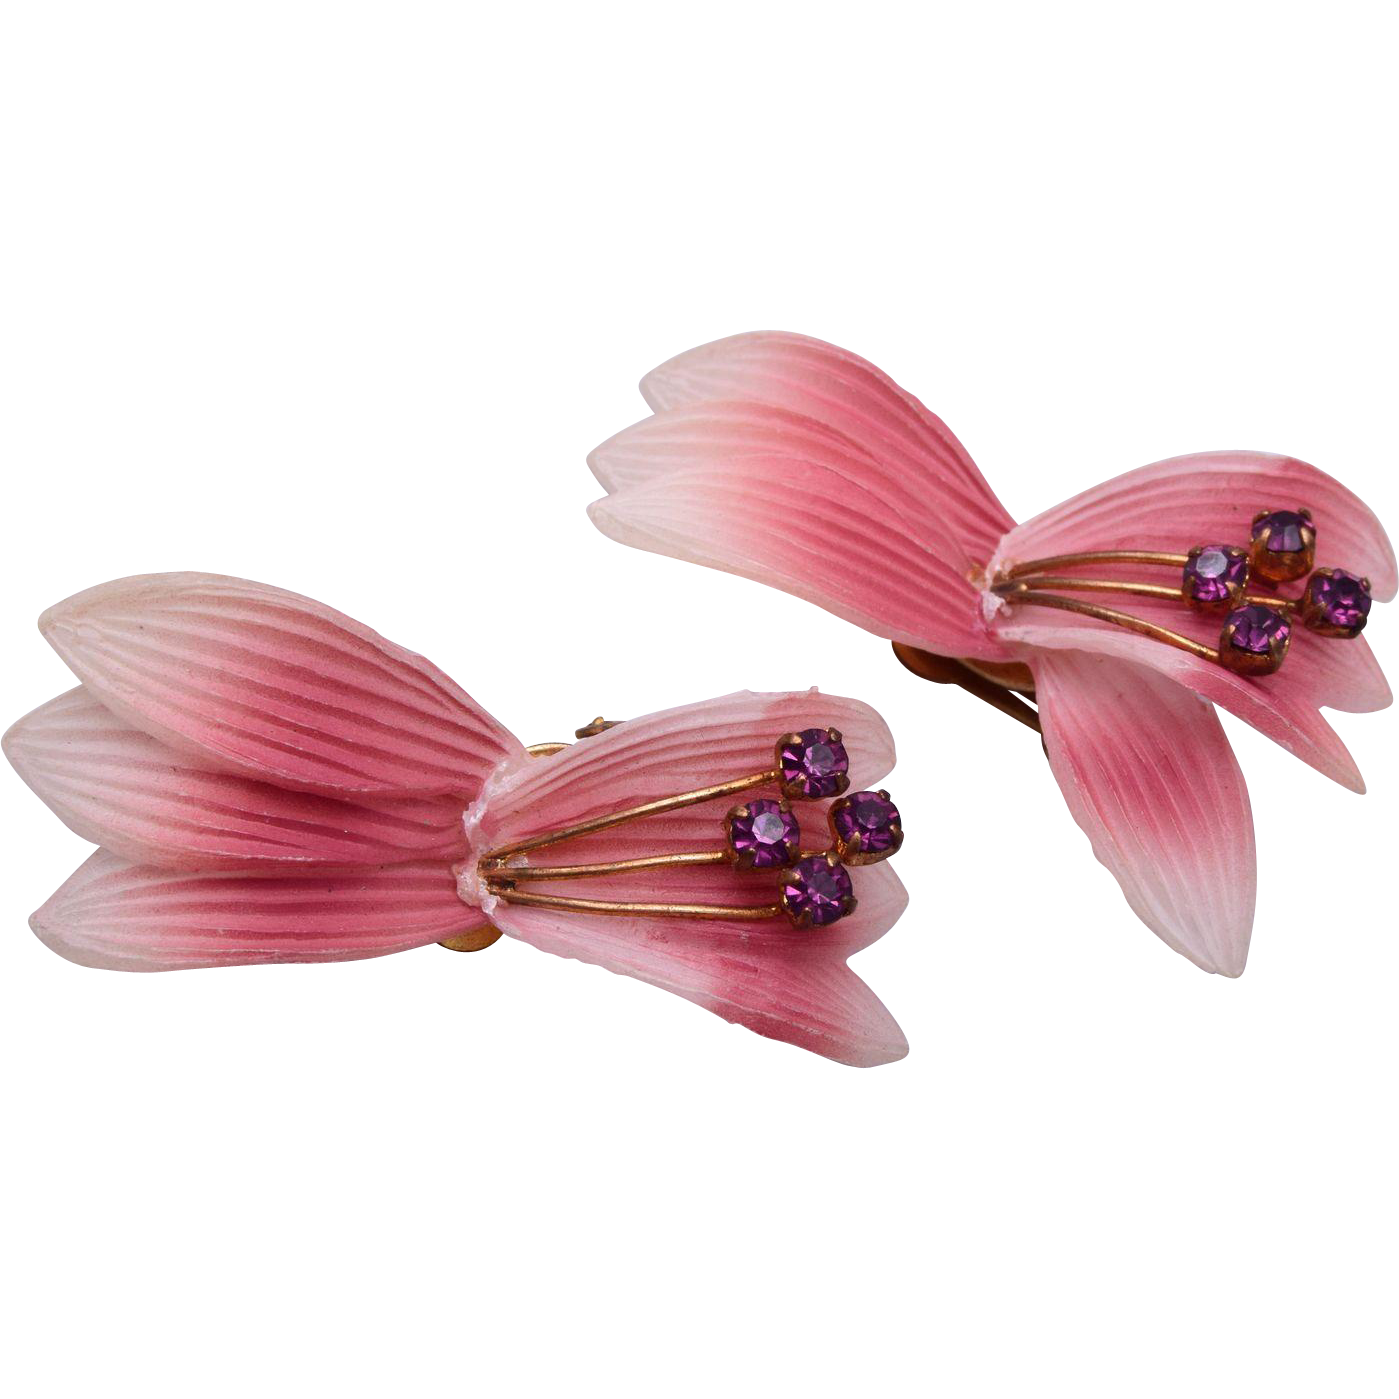 Plastic Orchid and Purple Rhinestone Earrings